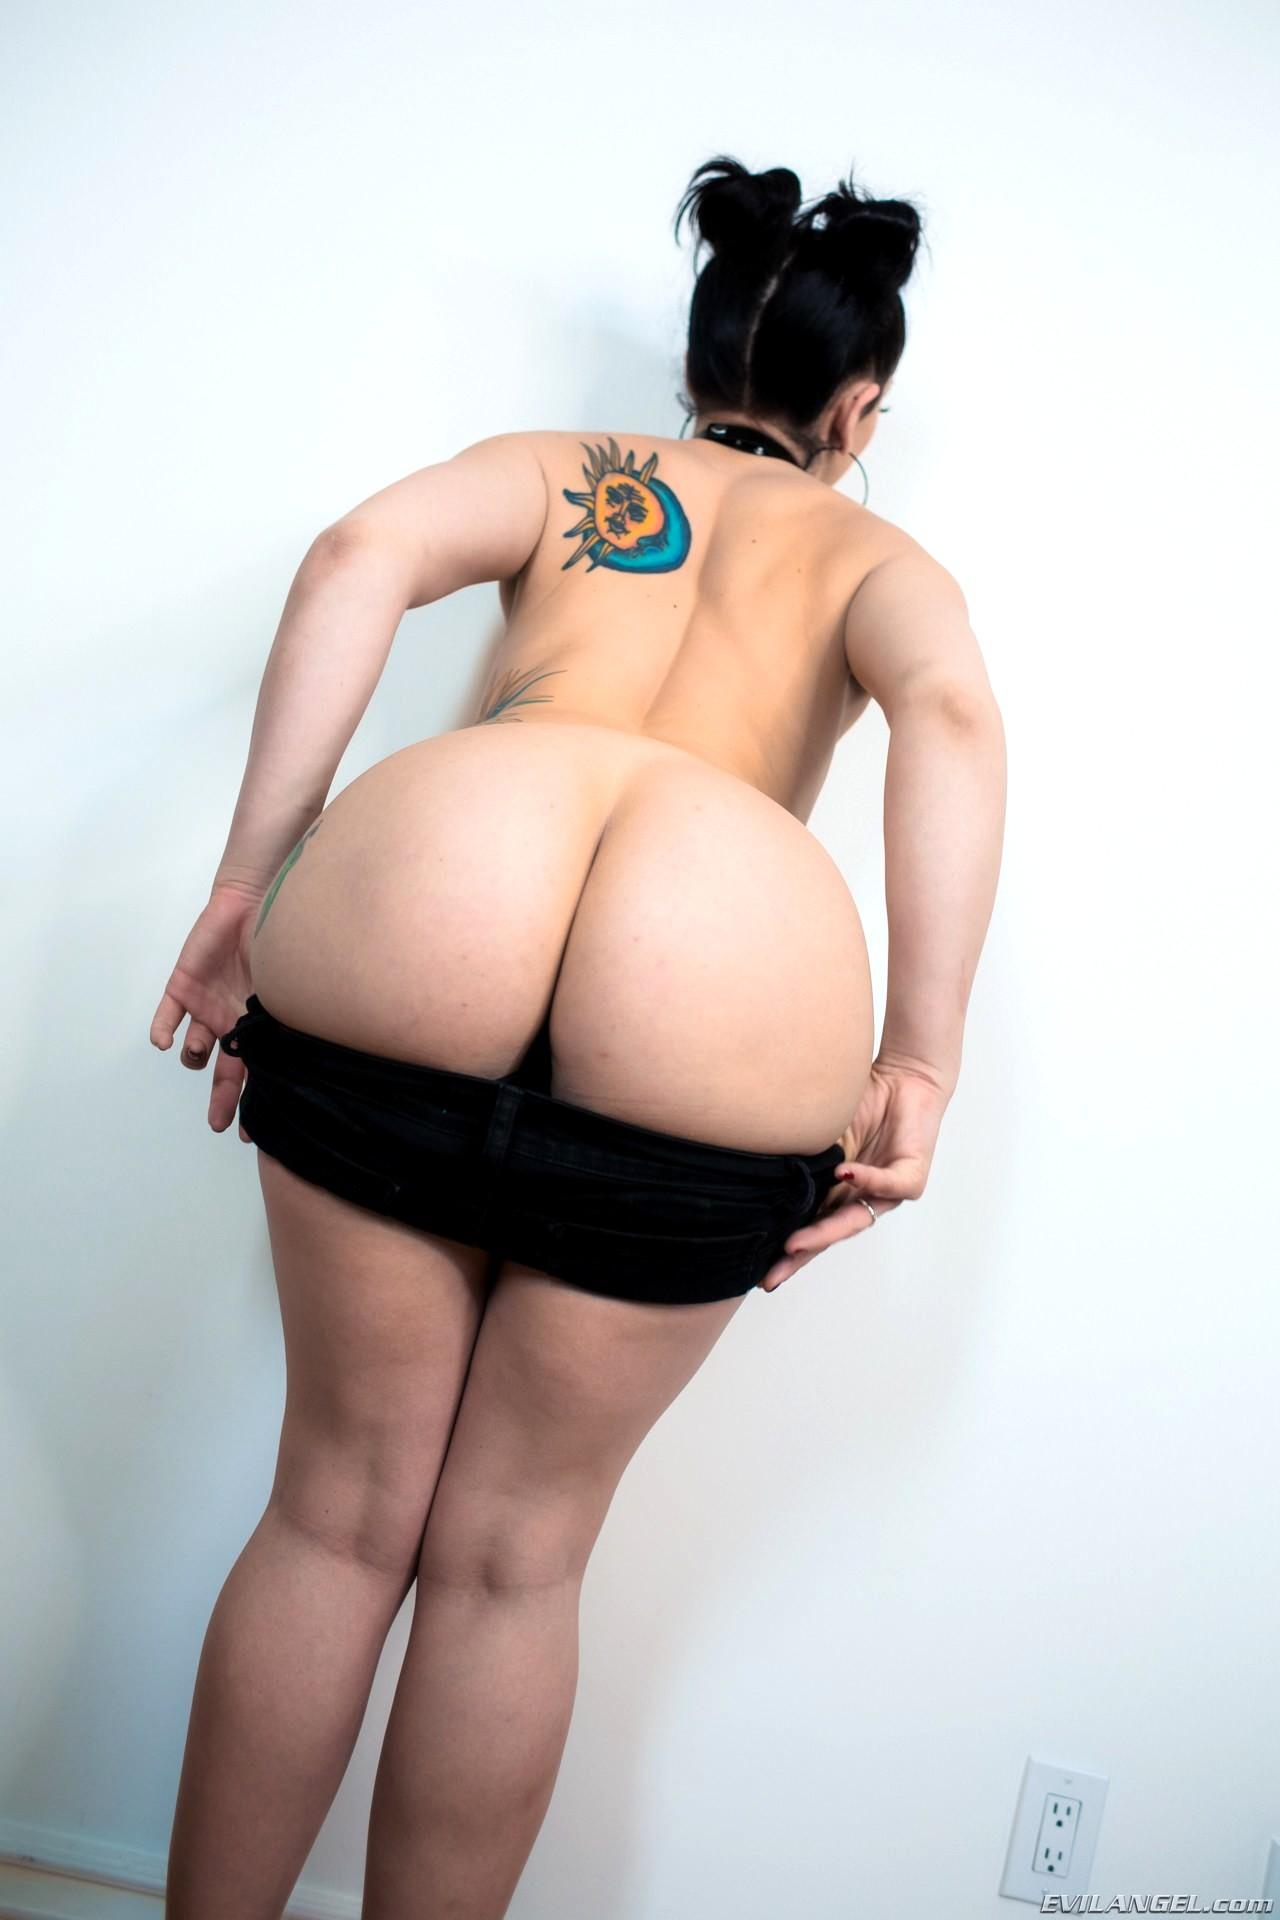 Nude mandy muse Mandy Muse